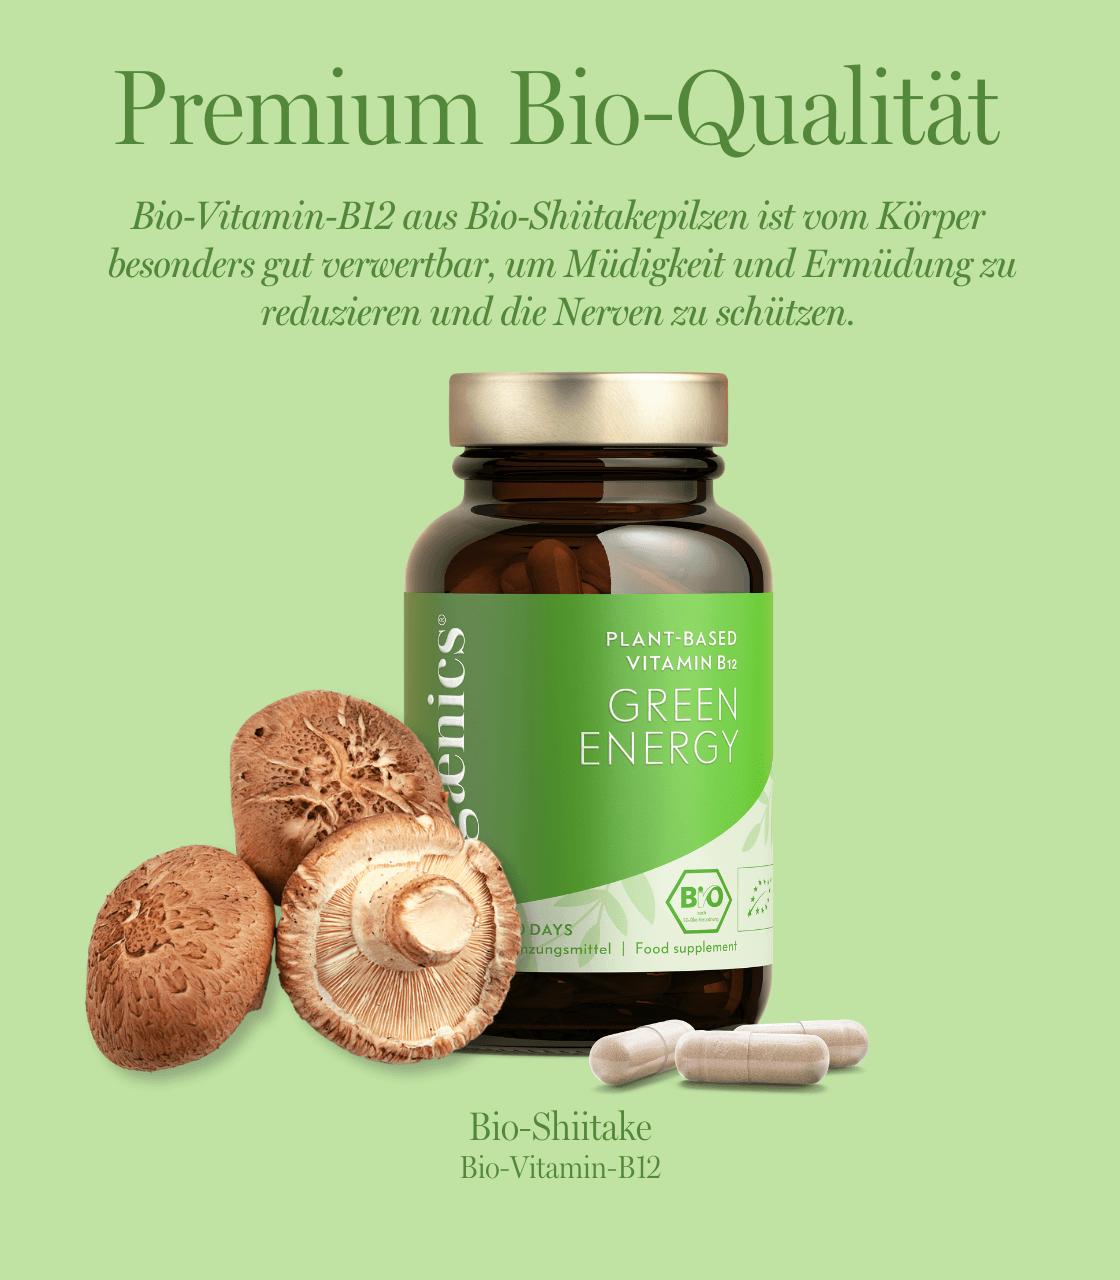 green-energy-plant-based-bio-vitamin-b12-nahrungsergaenzung